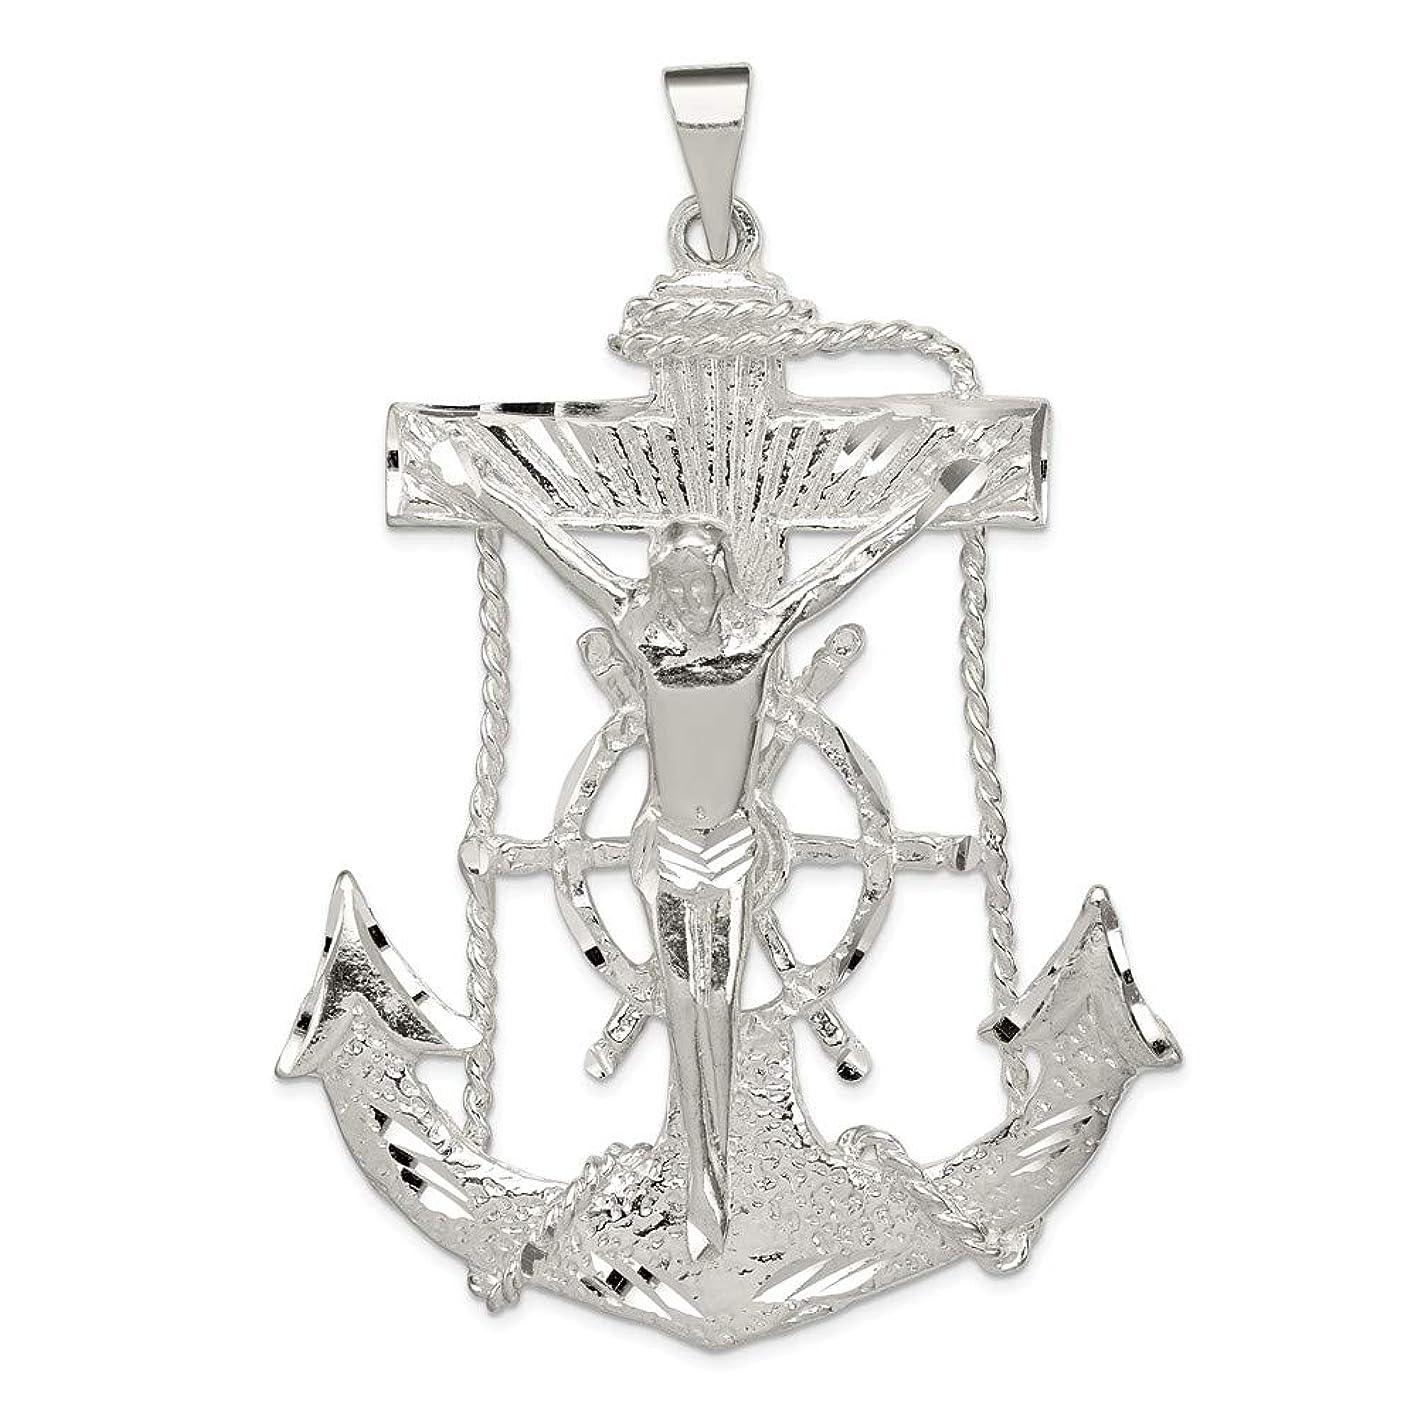 Mia Diamonds 925 Sterling Silver Solid Mariner Cross Pendant (79mm x 55mm) kttvfshsusy100